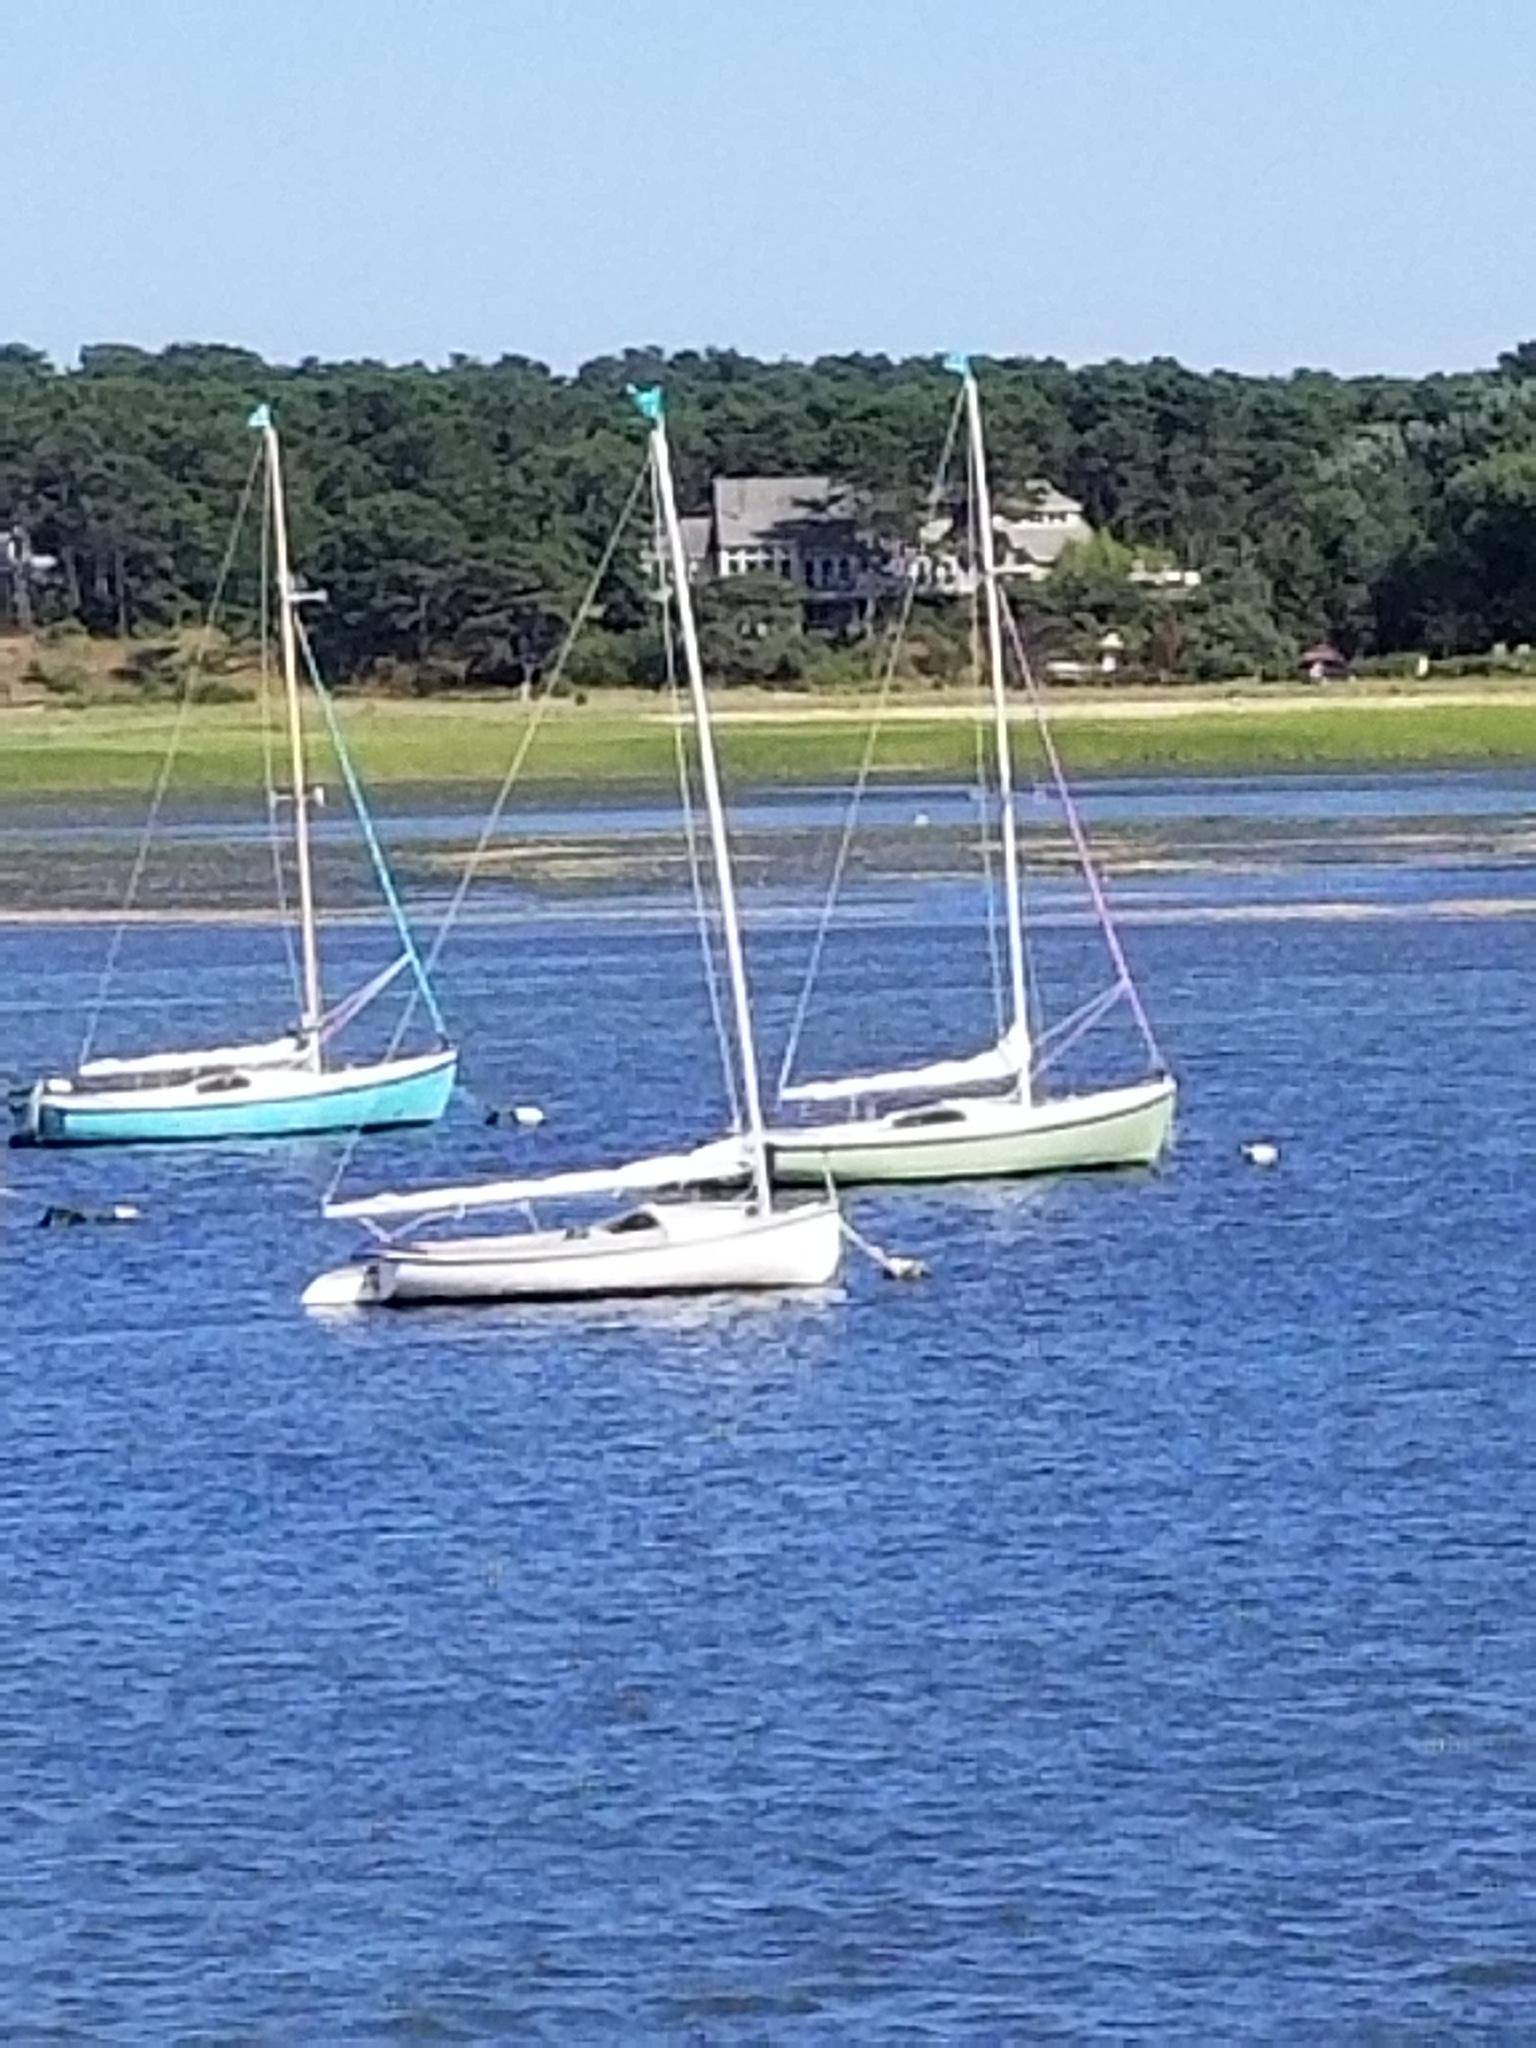 Cape cod, Massachusetts  by denise.bouvier.3